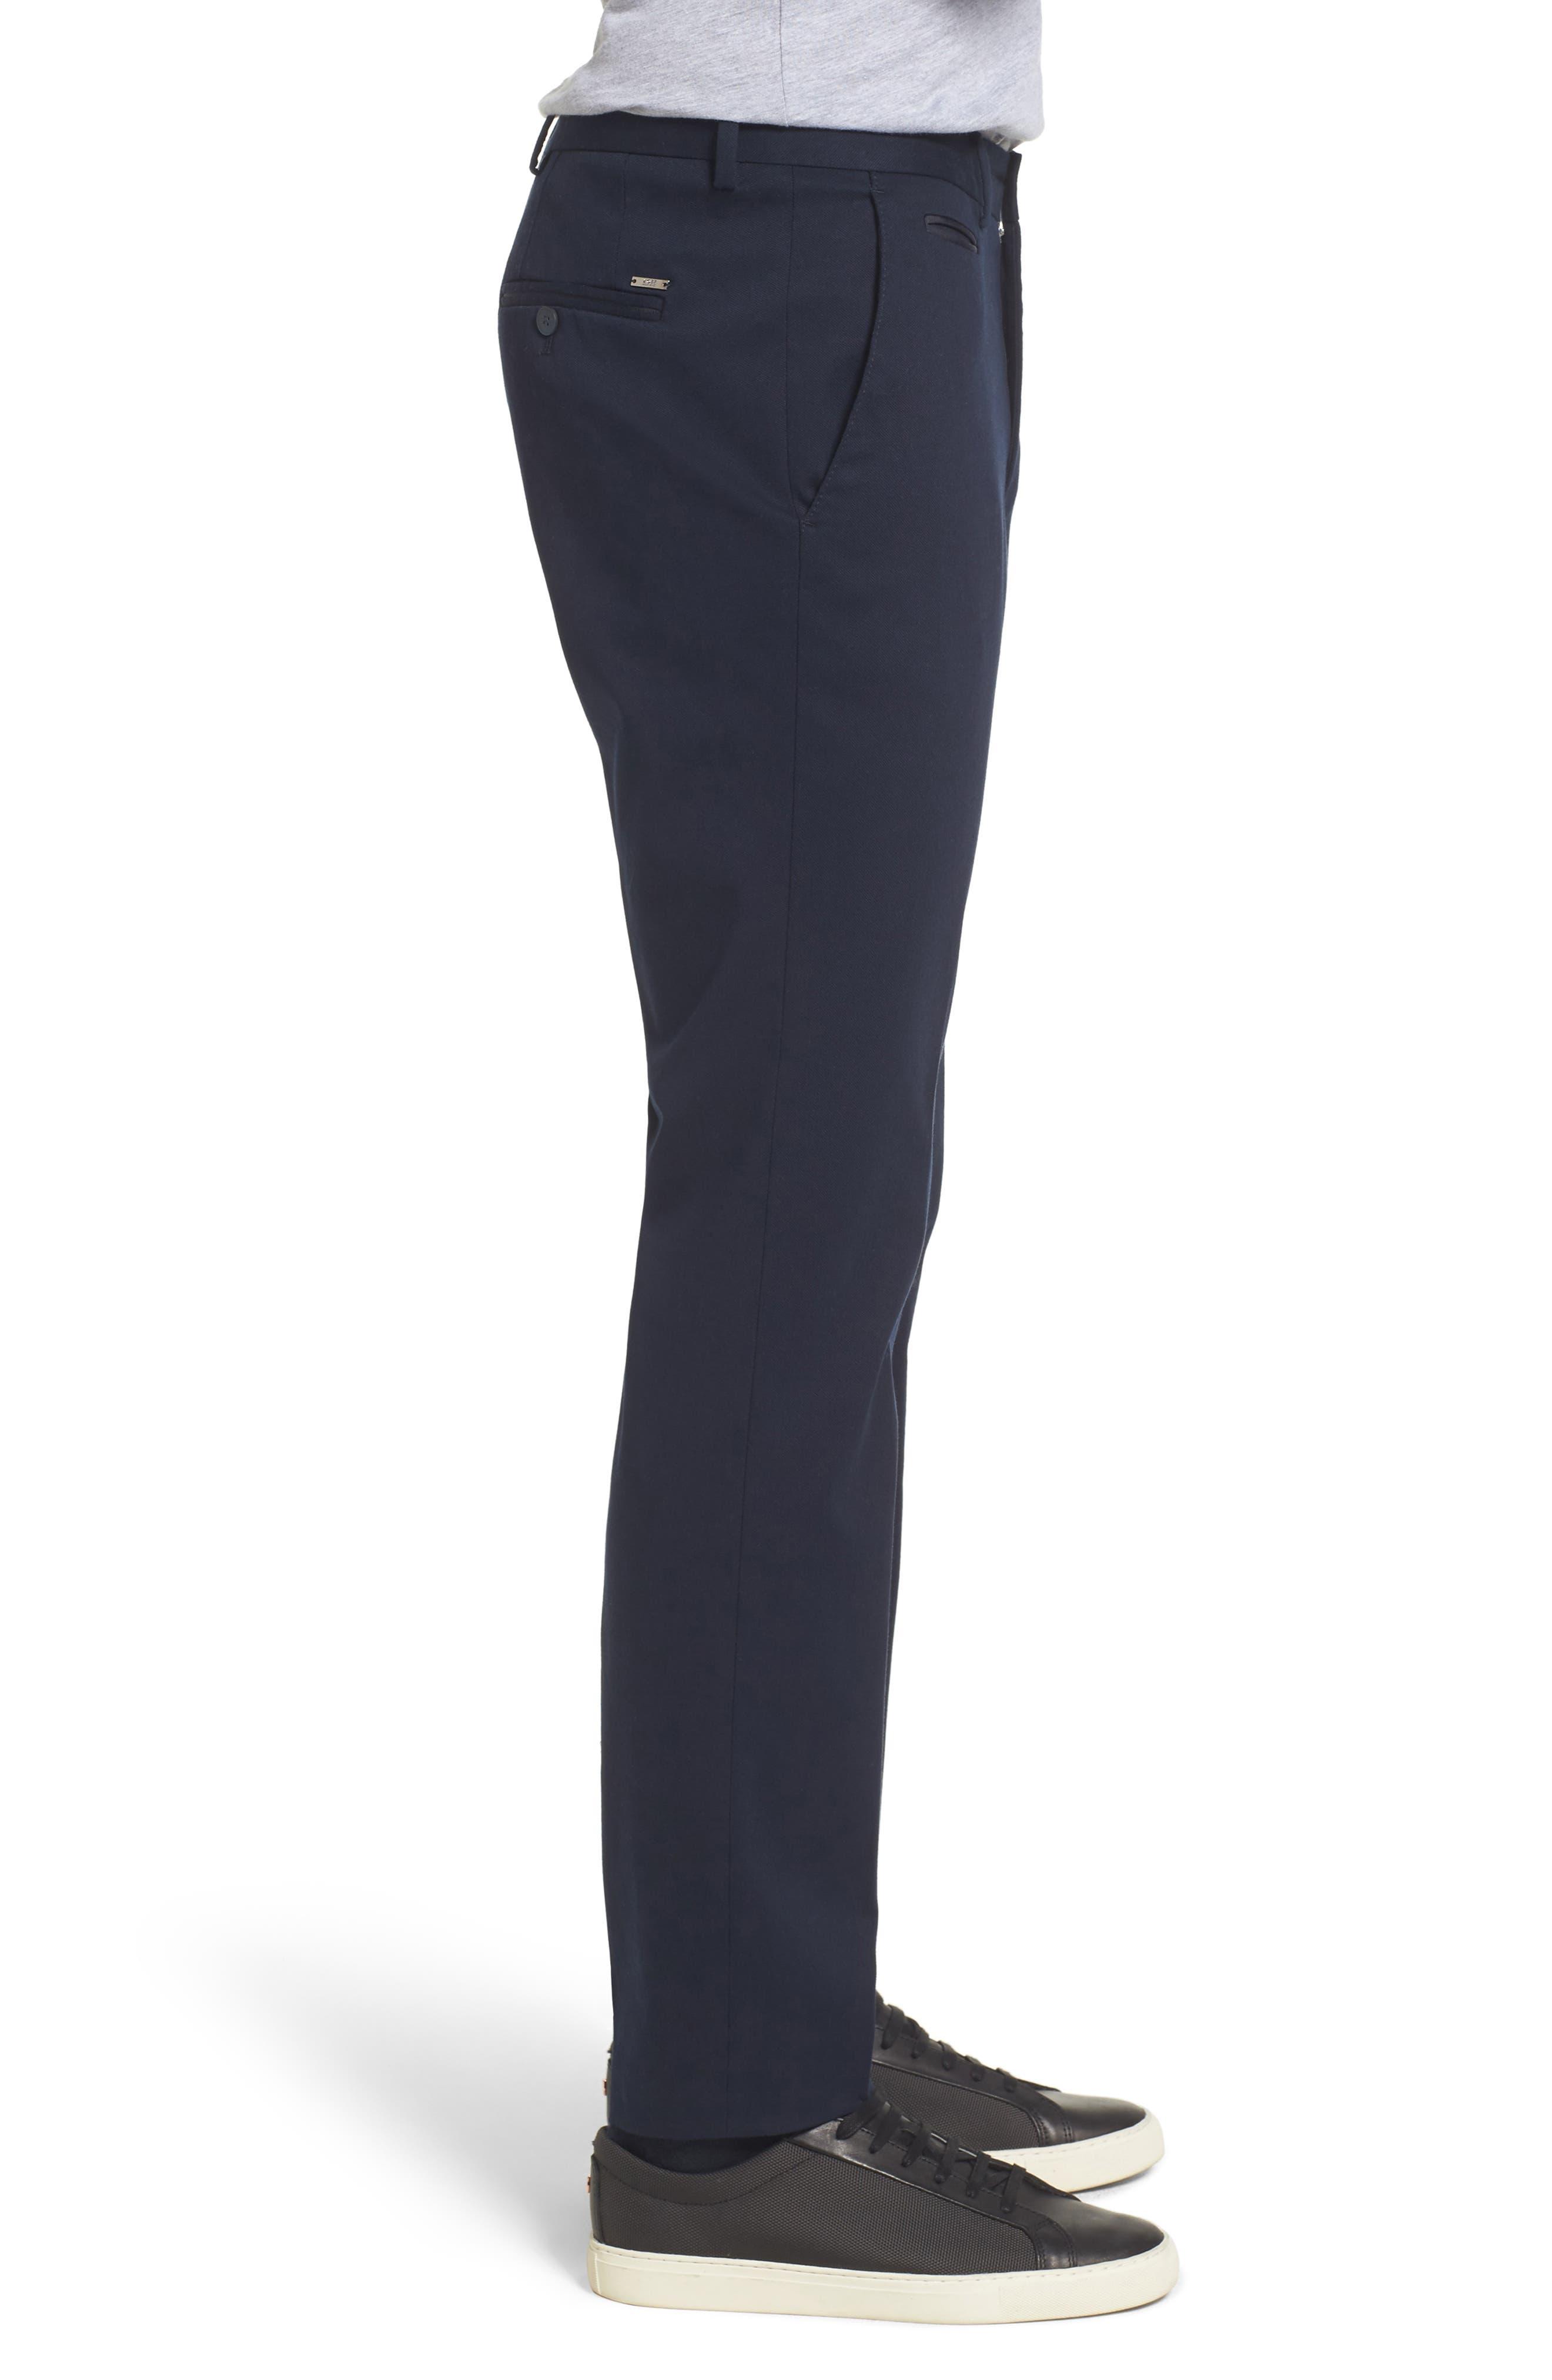 Batho-W Regular Fit Trousers,                             Alternate thumbnail 3, color,                             Navy